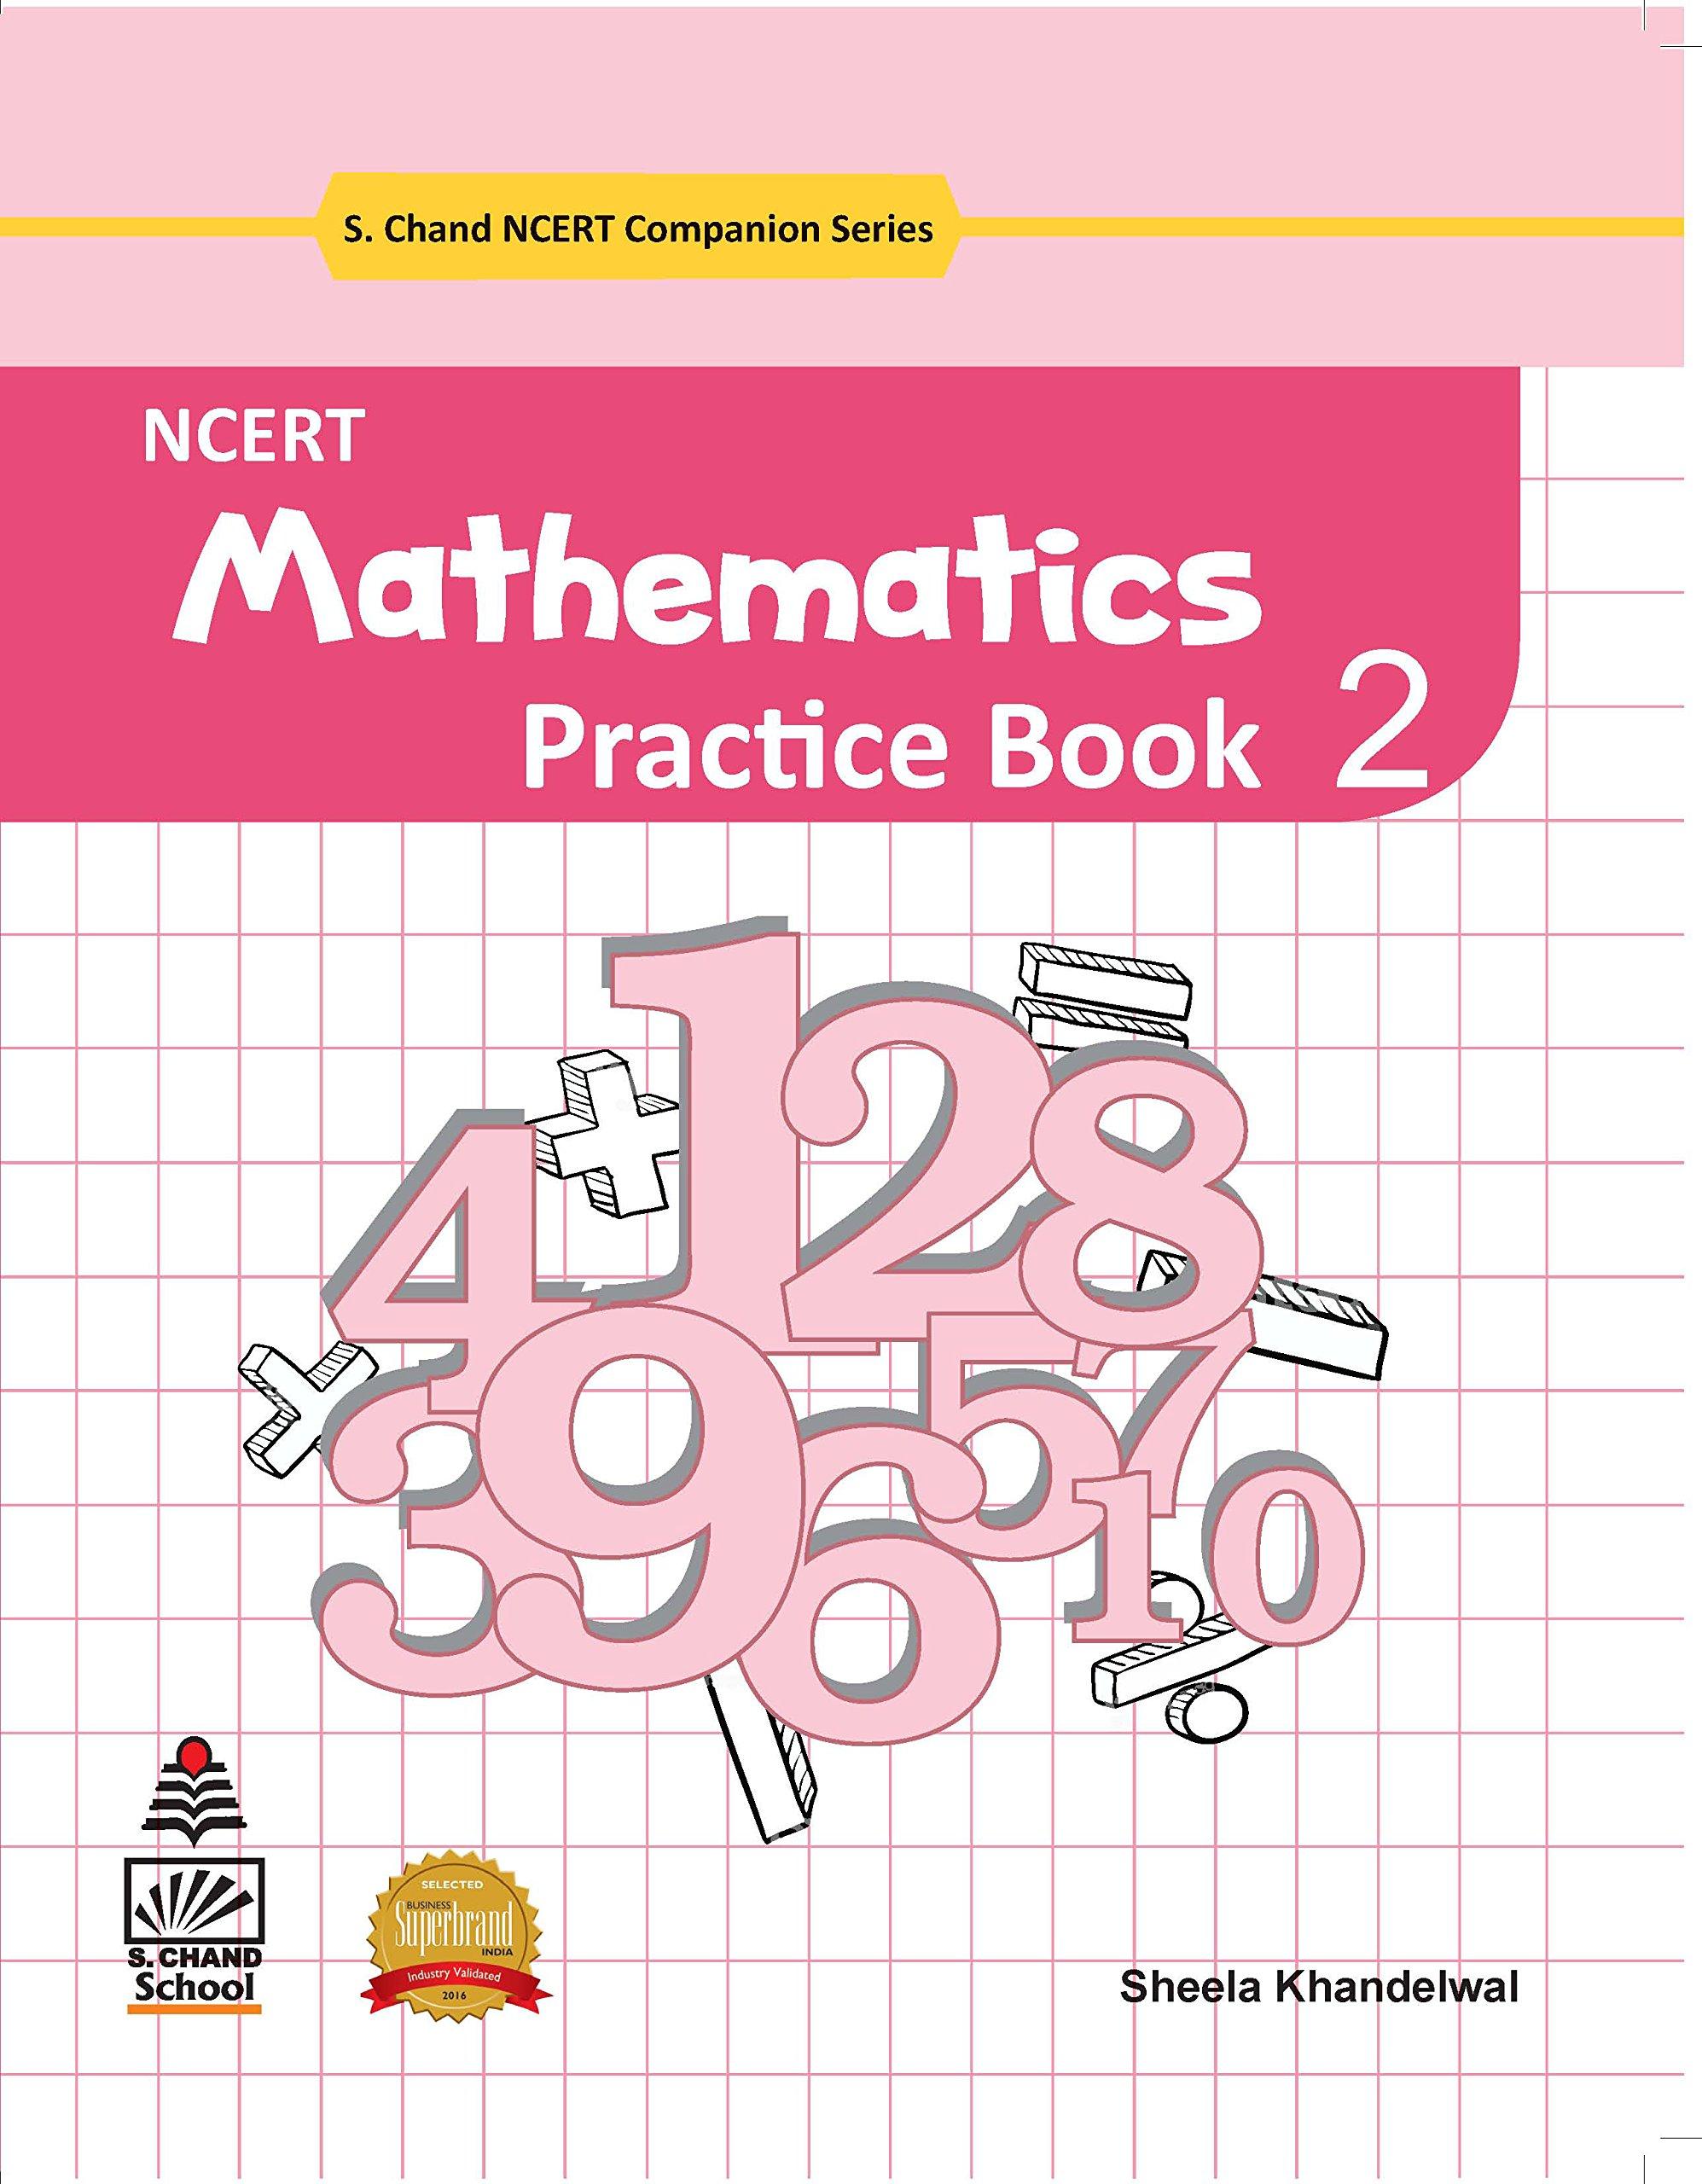 NCERT Mathematics Practice Book for Class 2 2019 Exam